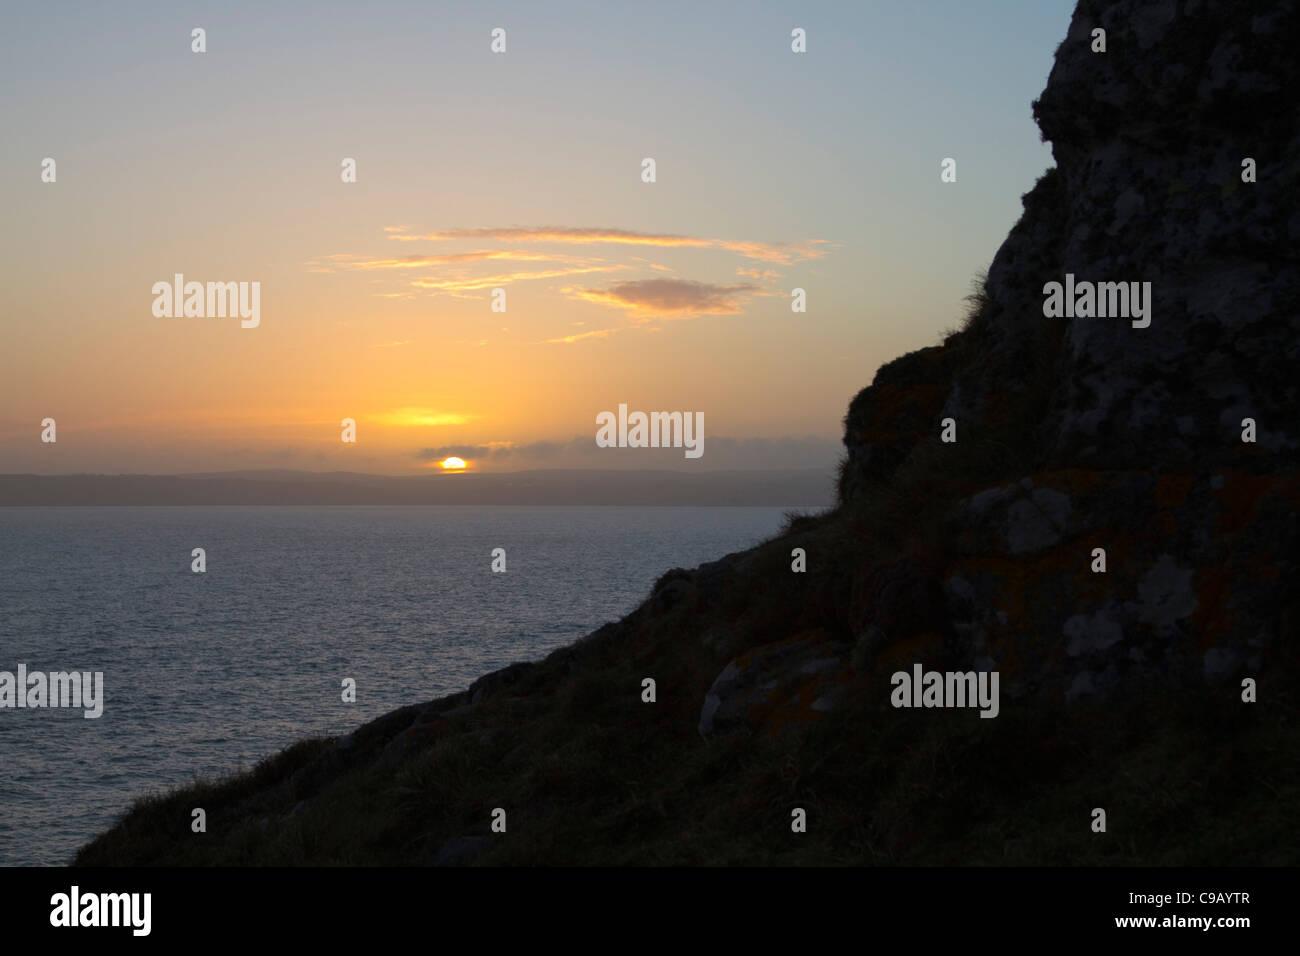 Sunset; Cornwall; minus three stops exposure compensation; Mount's Bay - Stock Image